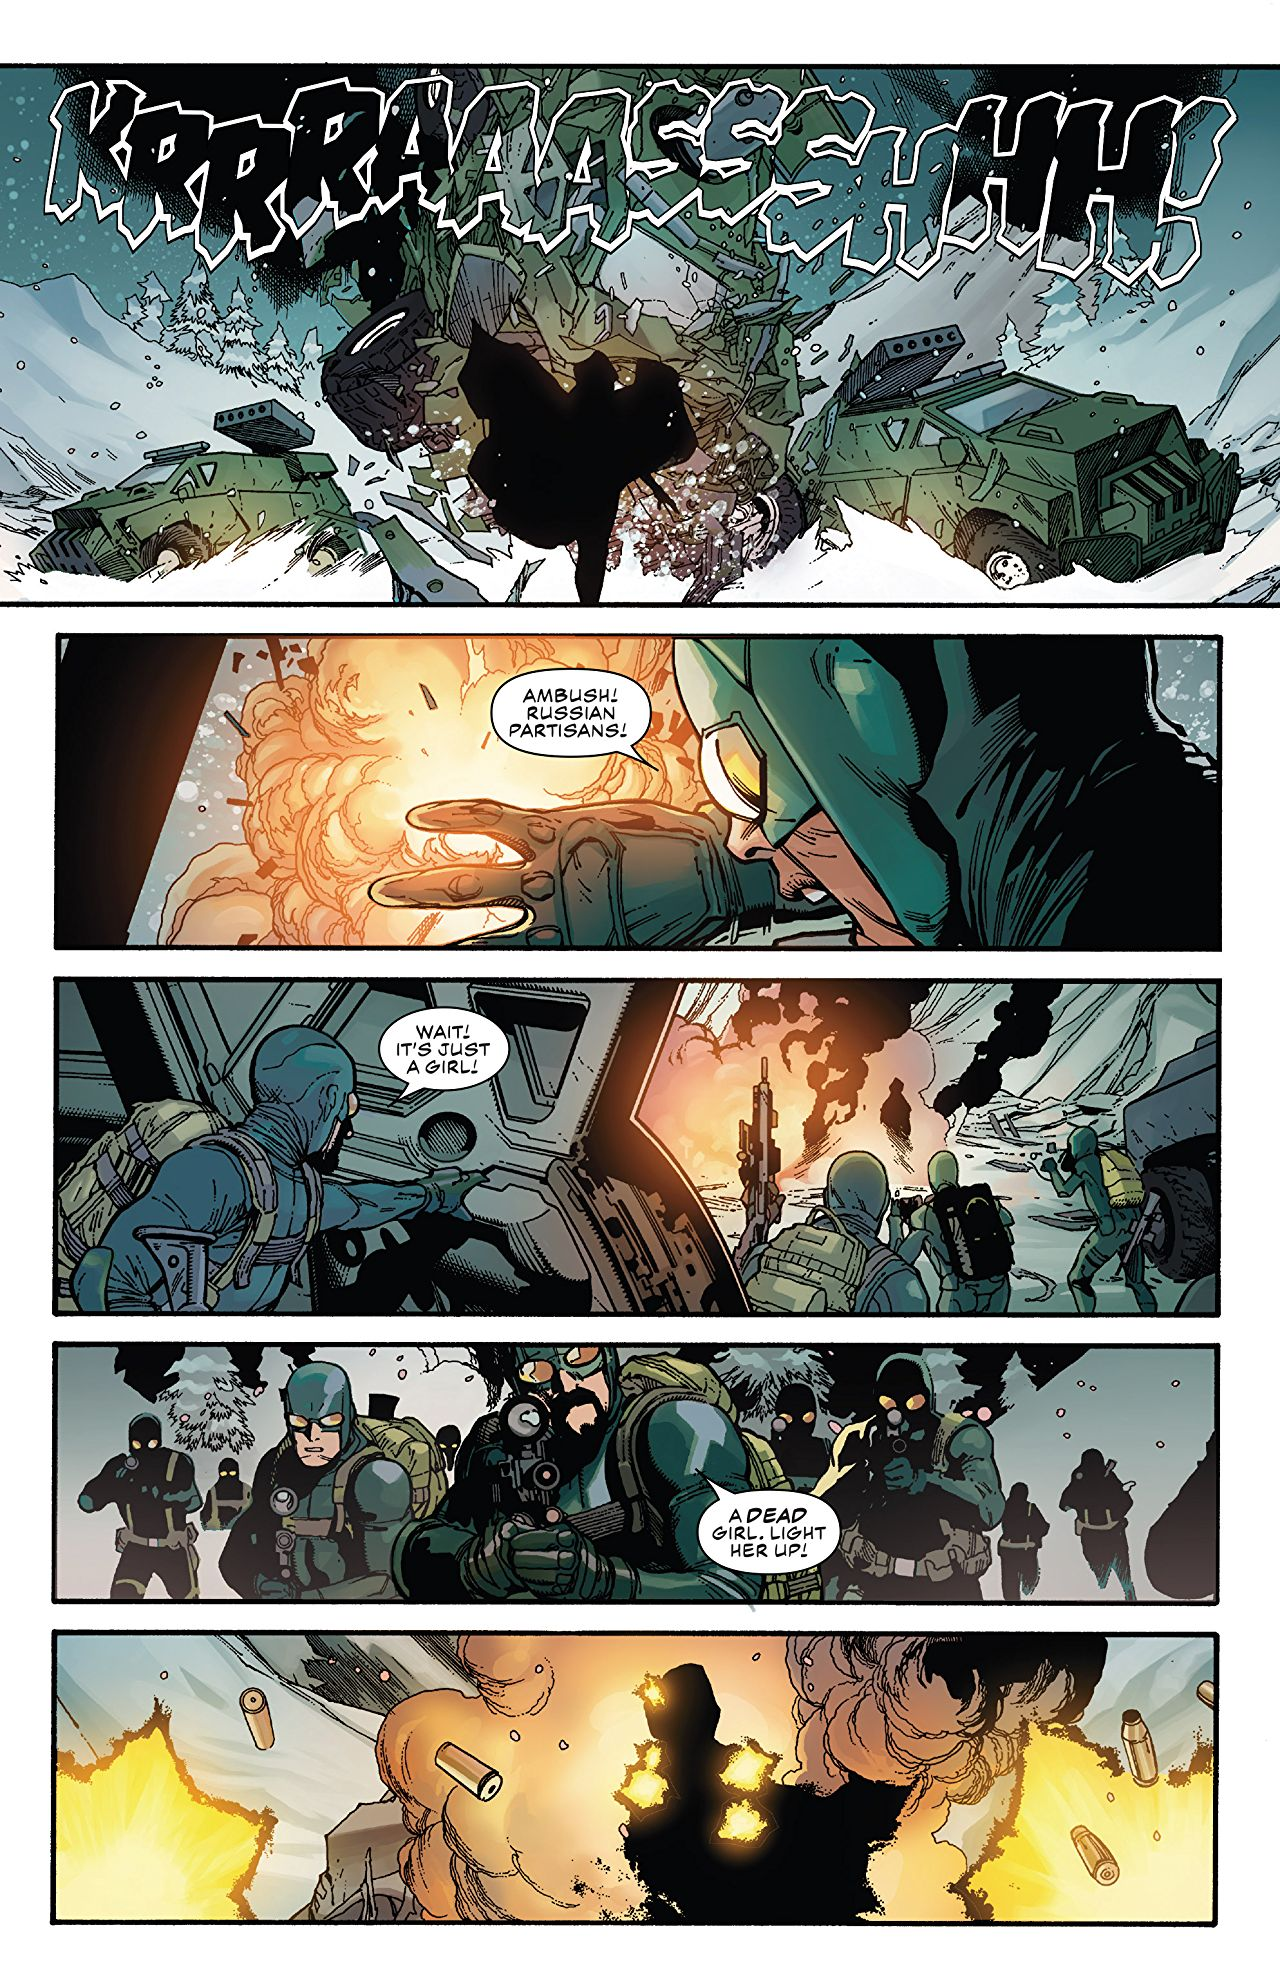 Captain America 1.3 Comic Book Review